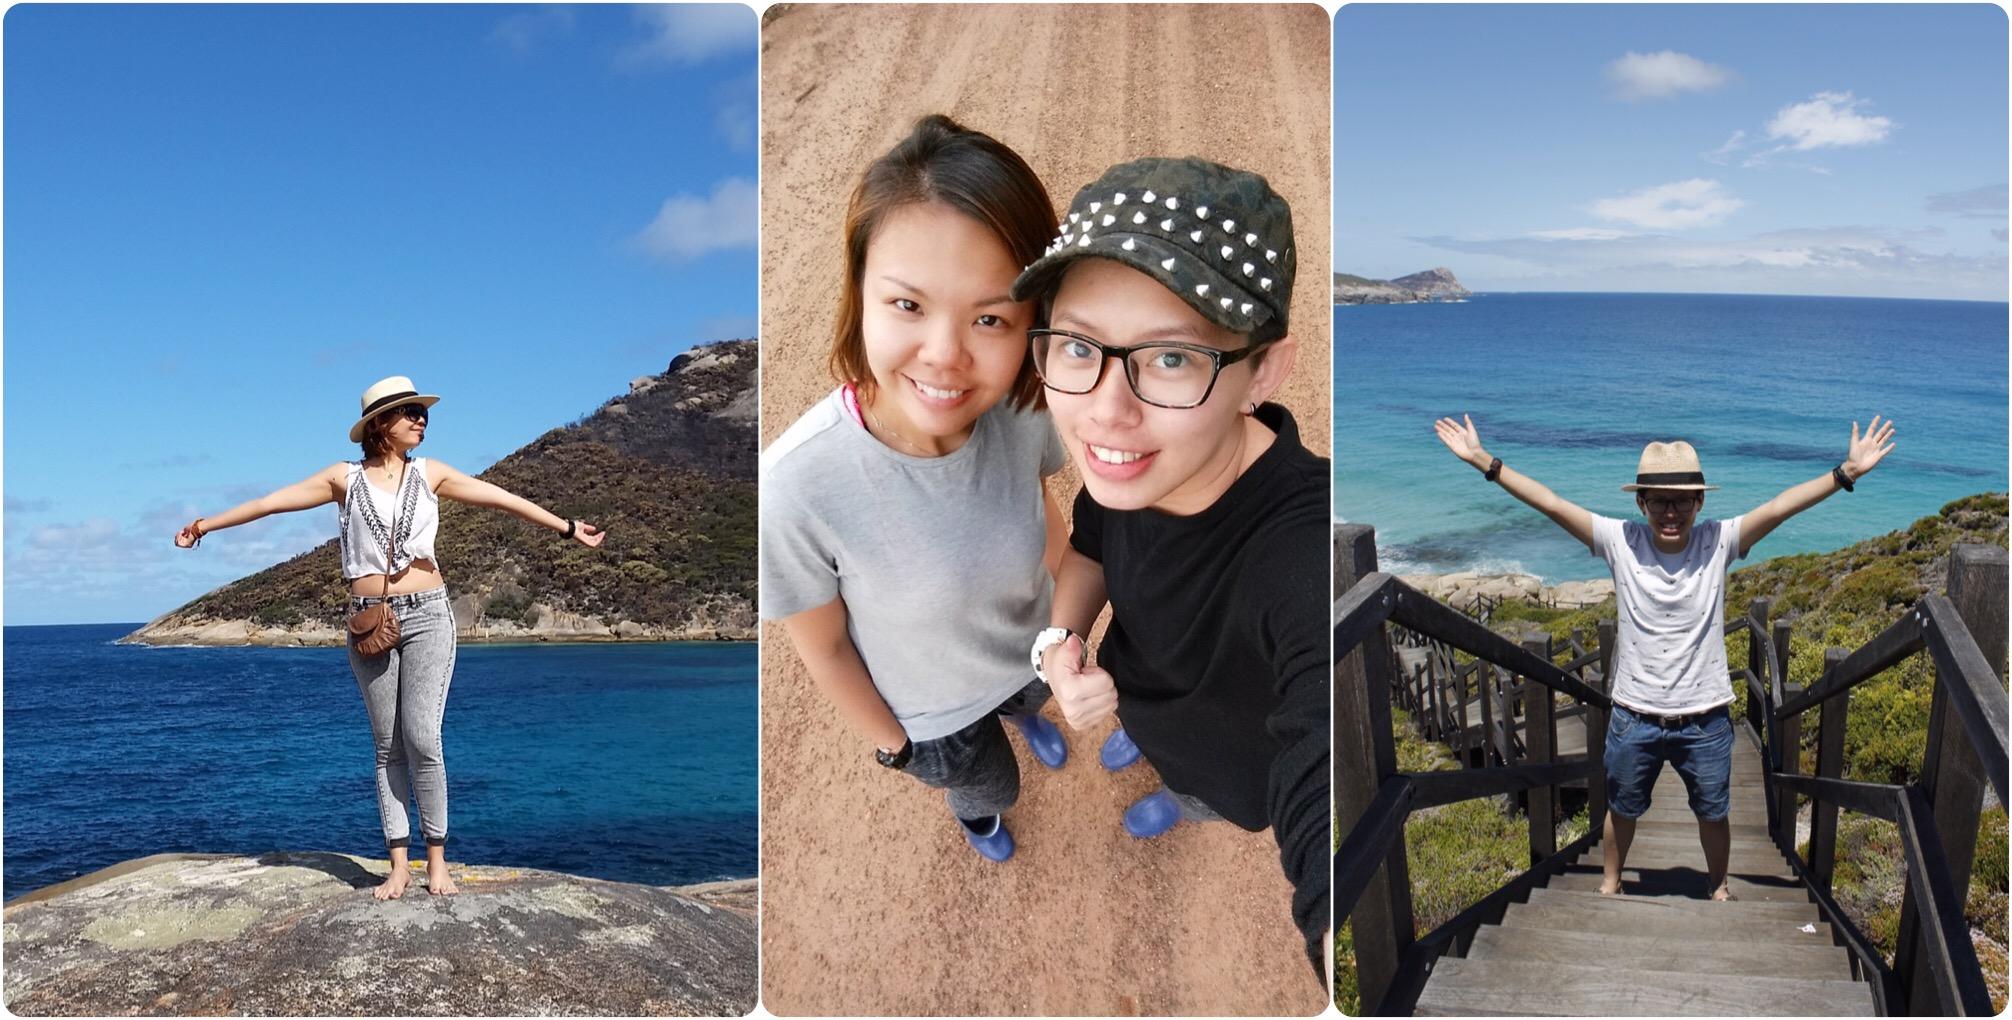 australia visa application work and holiday